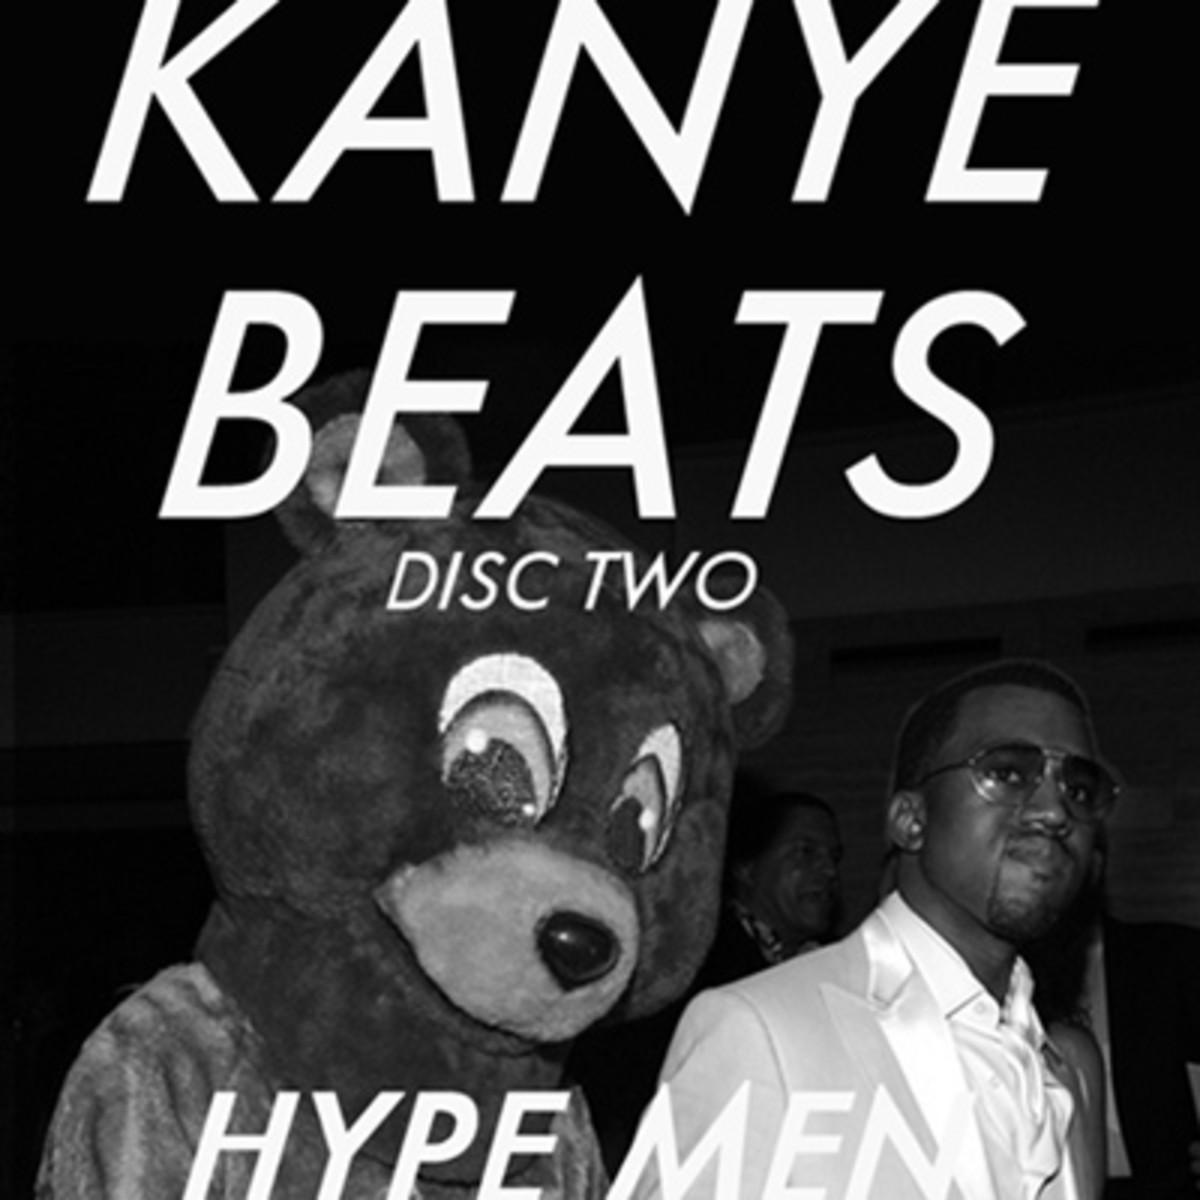 kanye-beats-2.jpg